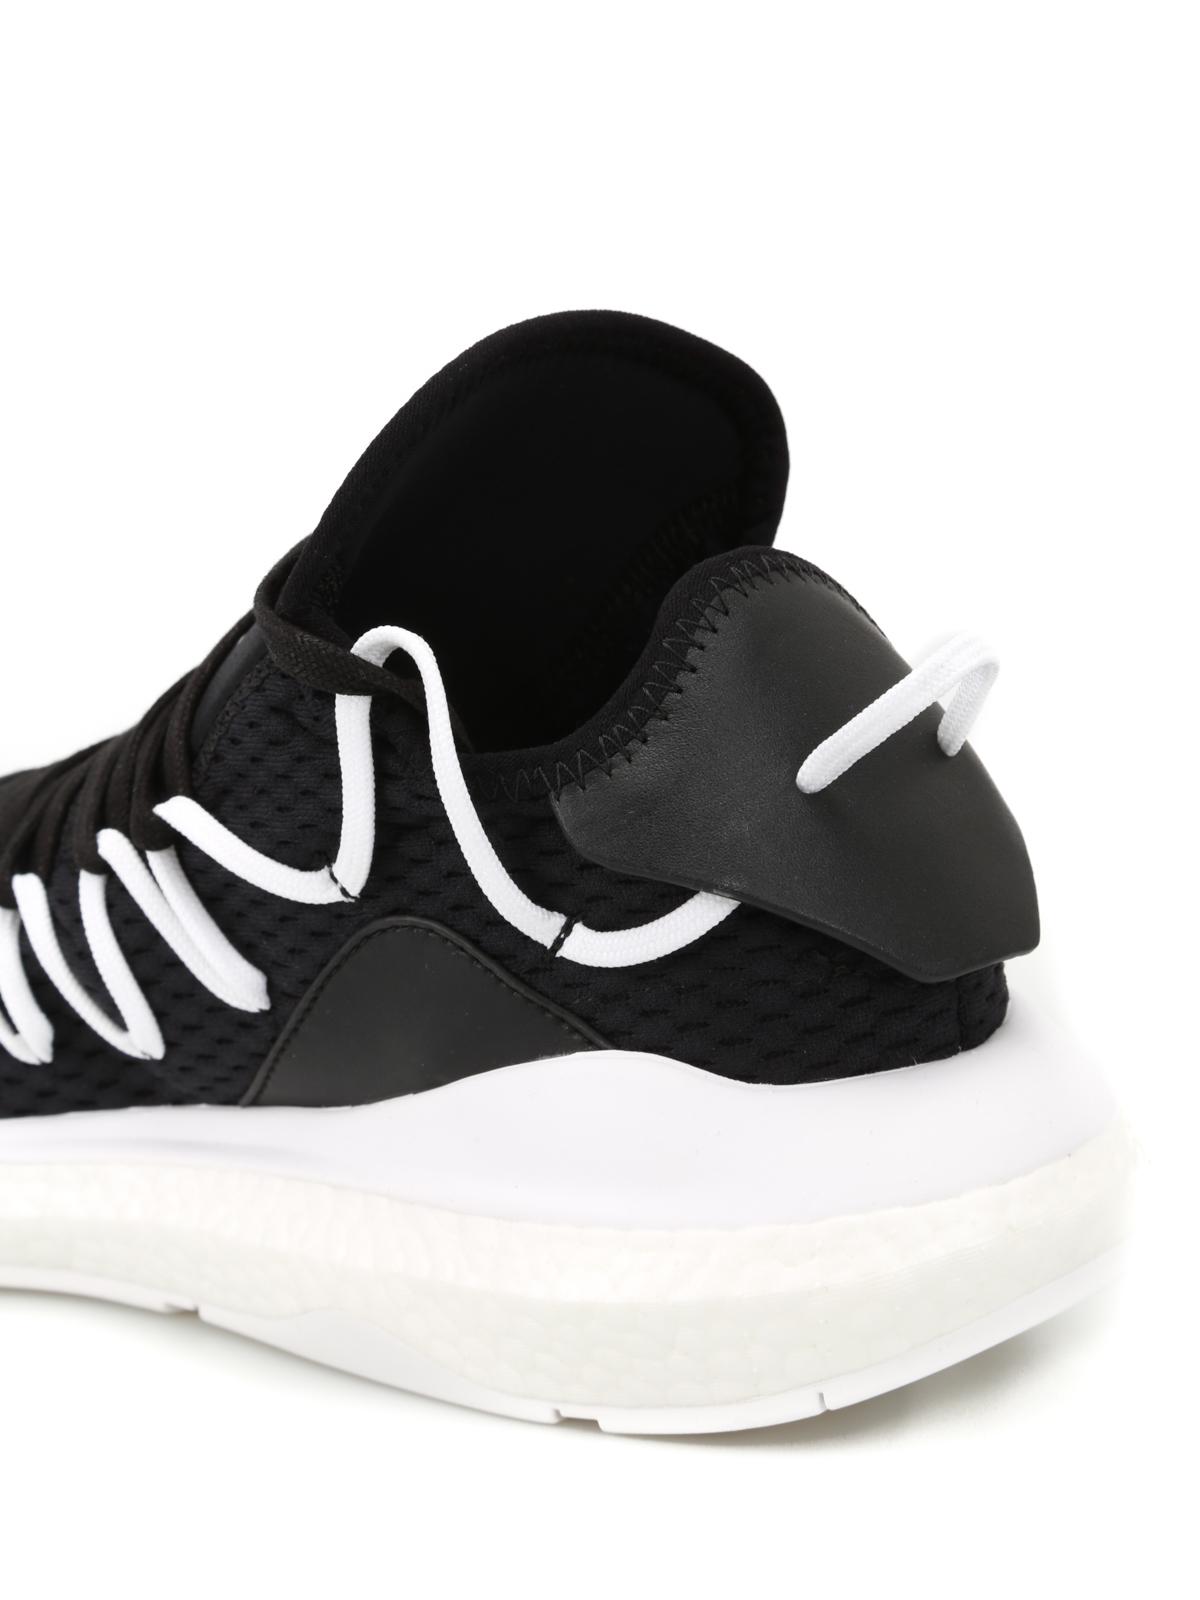 8bb27b775 Adidas Y-3 - Kusari bicolour sneakers - trainers - DB2079